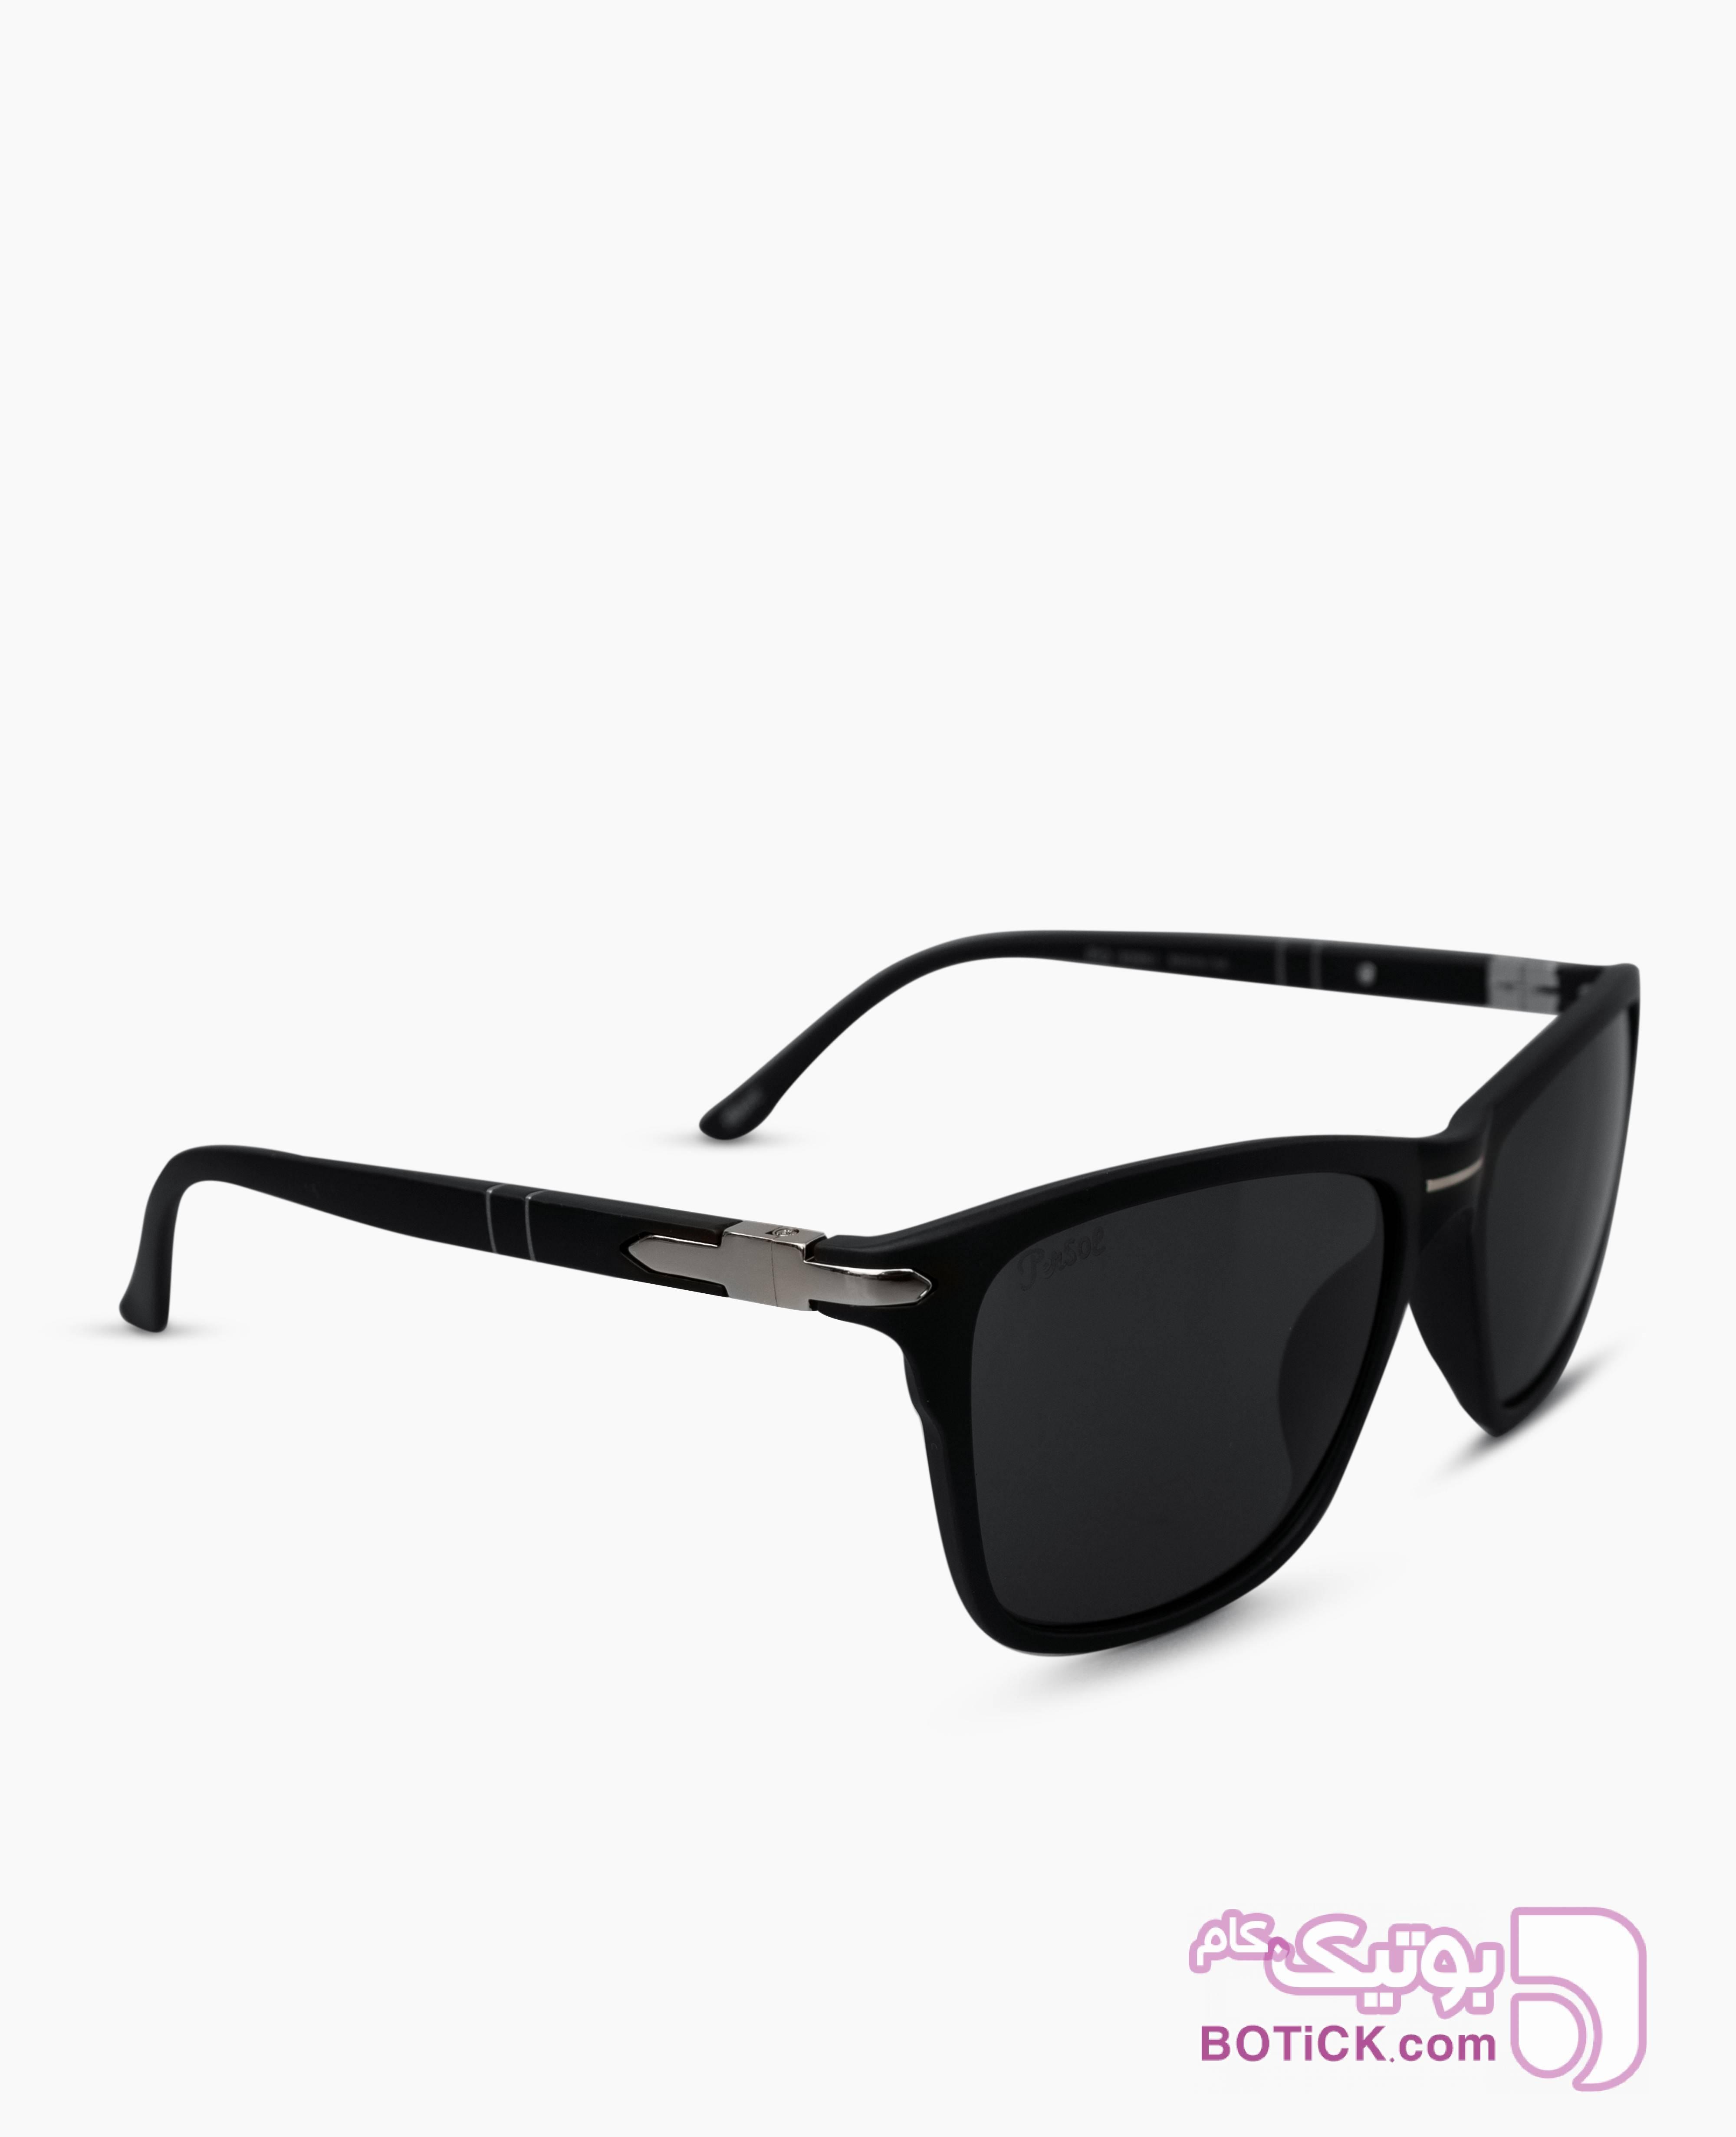 عینک آفتابی Persol کد 9286 مشکی عینک آفتابی